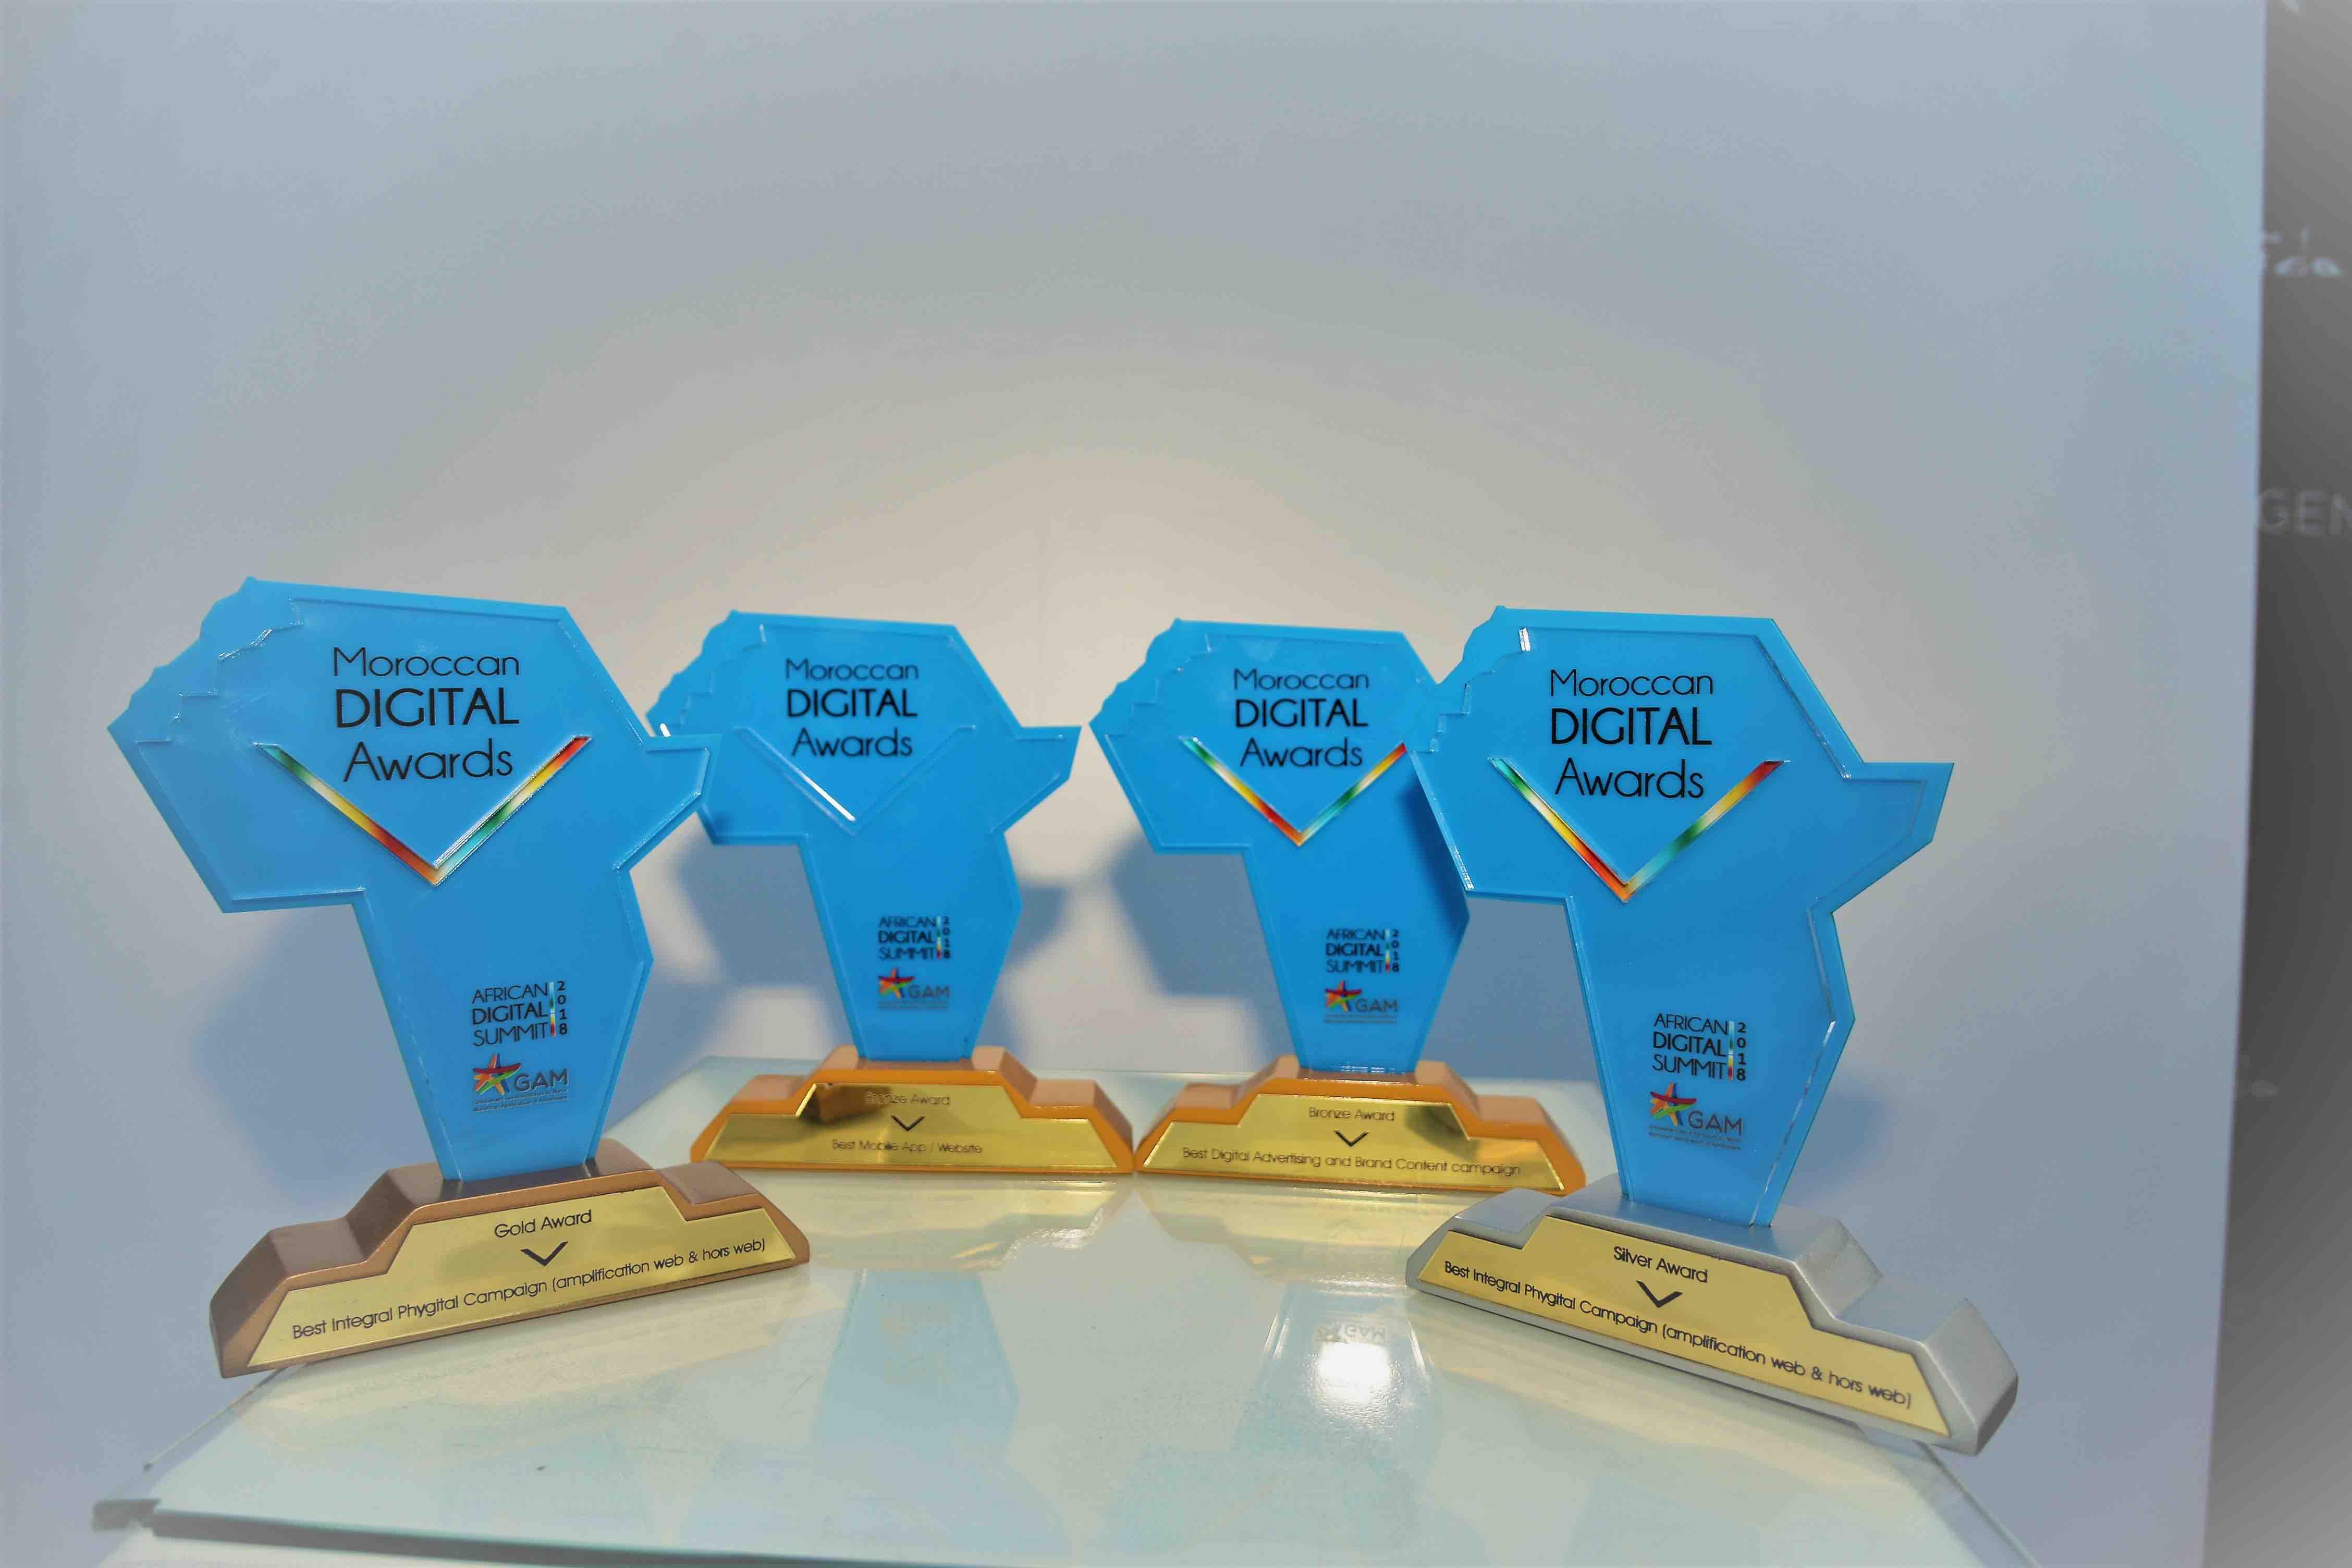 inwi, entreprise la plus titrée des Moroccan Digital Awards 2018